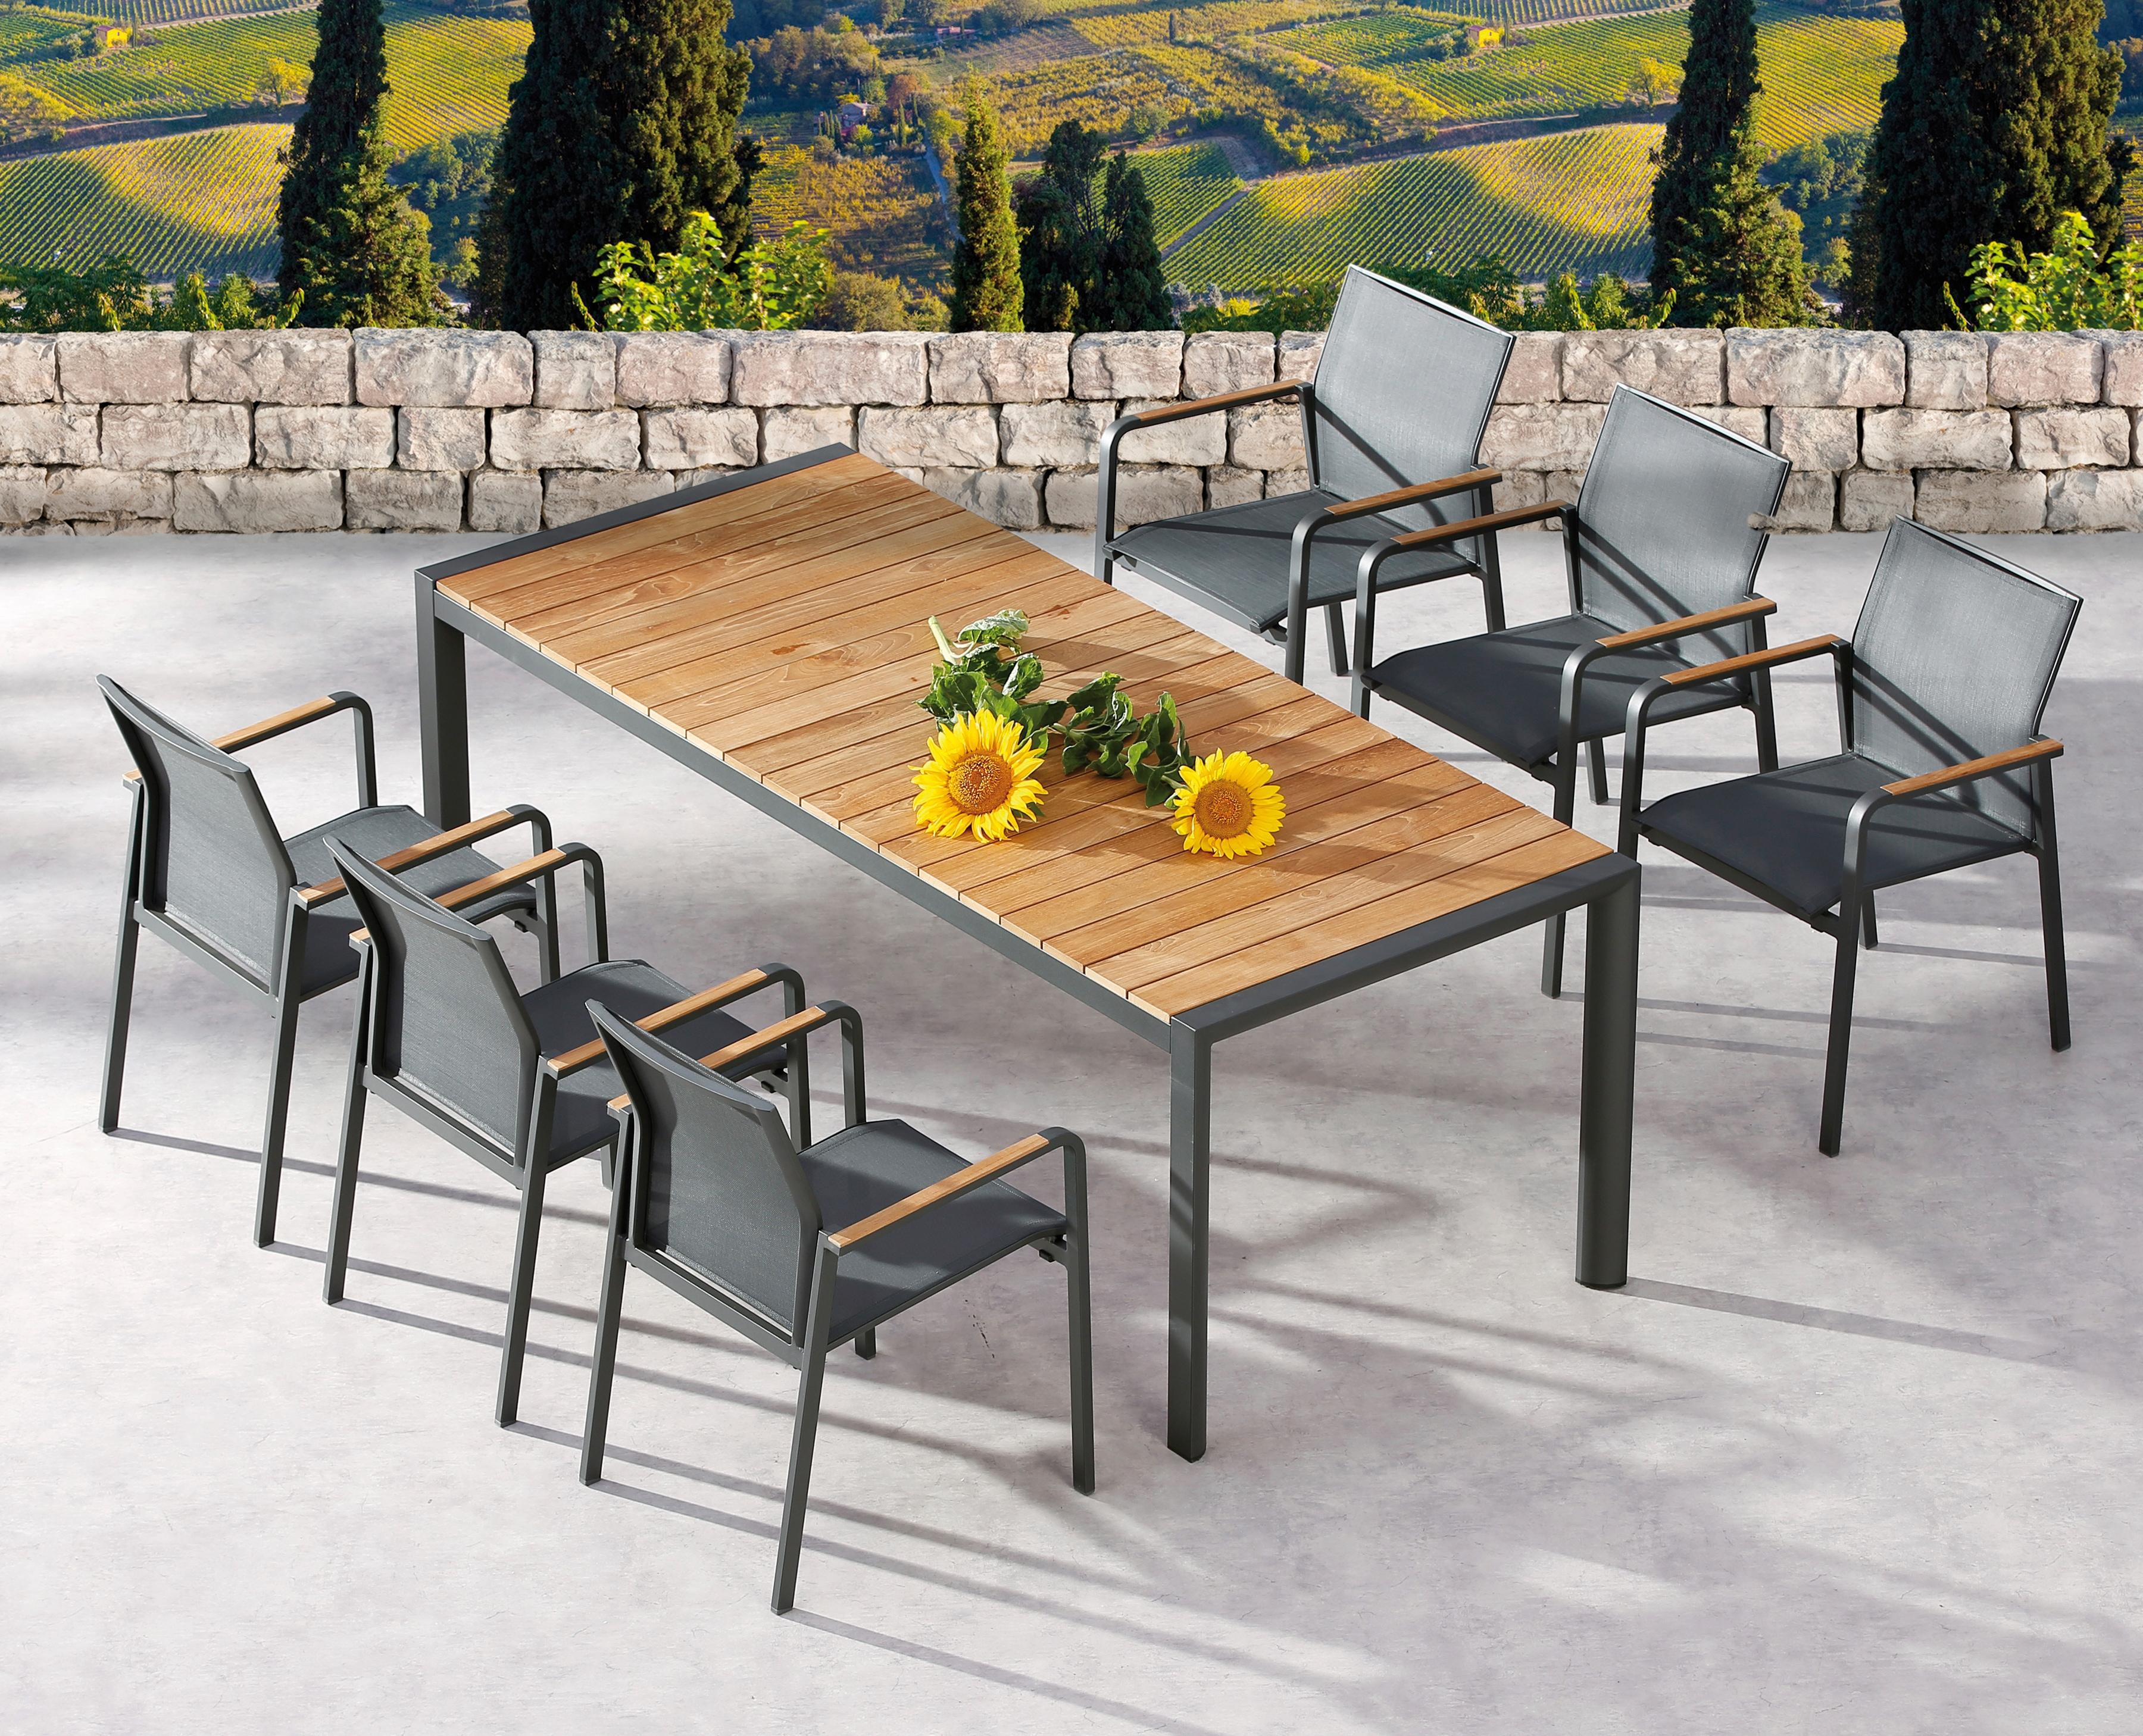 BEST Gartenmöbelset Paros 7-tlg 6 Sessel Tisch 210x90 cm stapelbar Teak/Ergotex